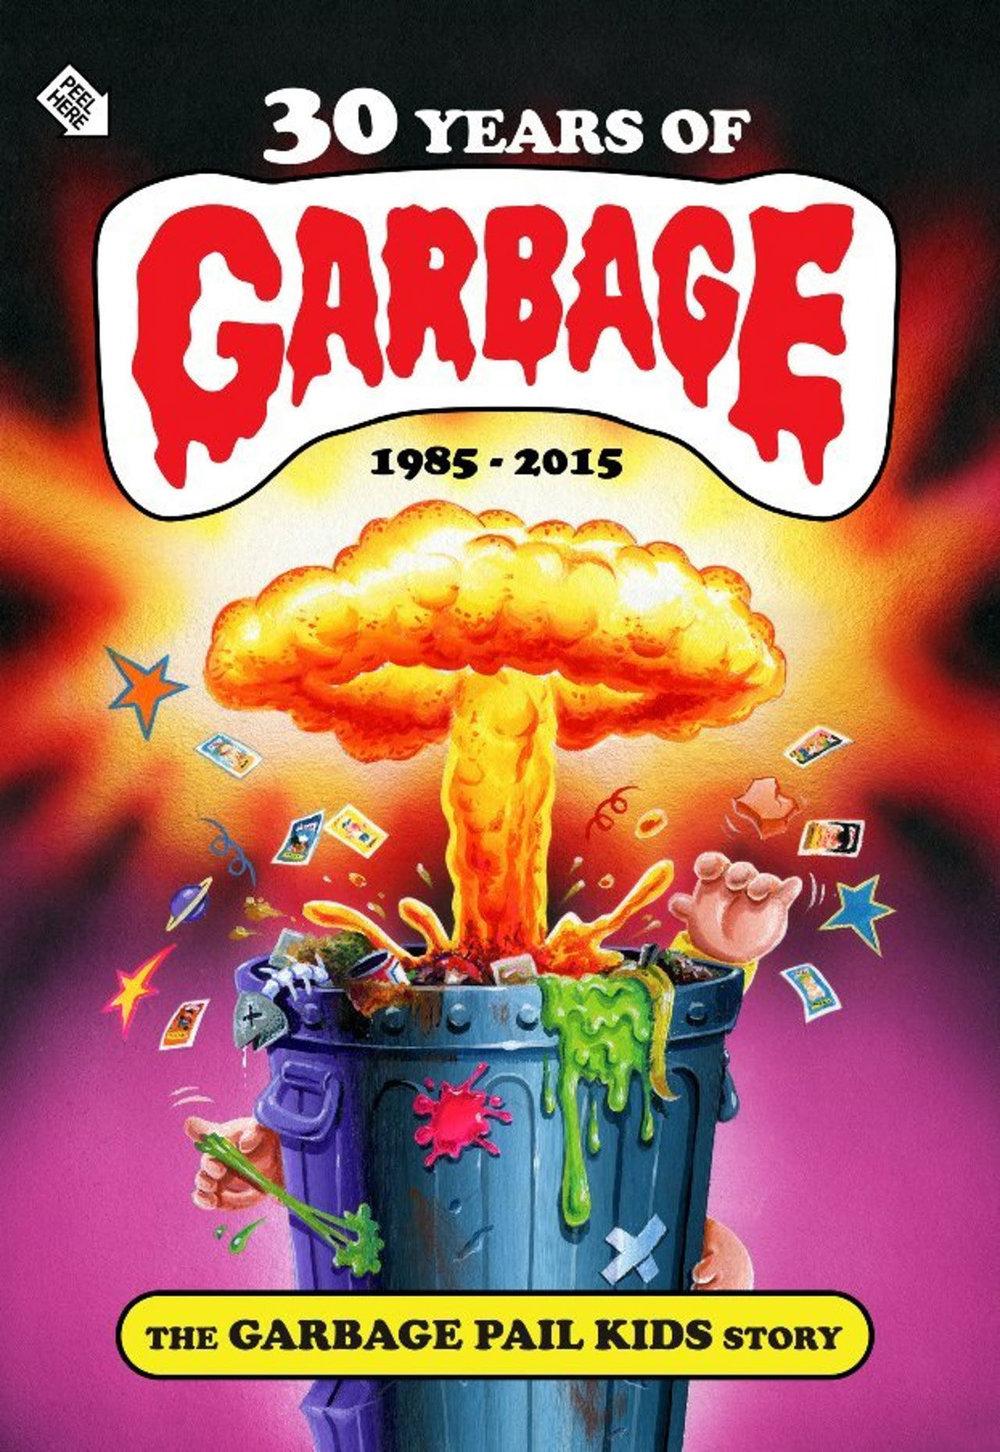 30 Years of Garbage: The Garbage Pail Kids Story Trailer33